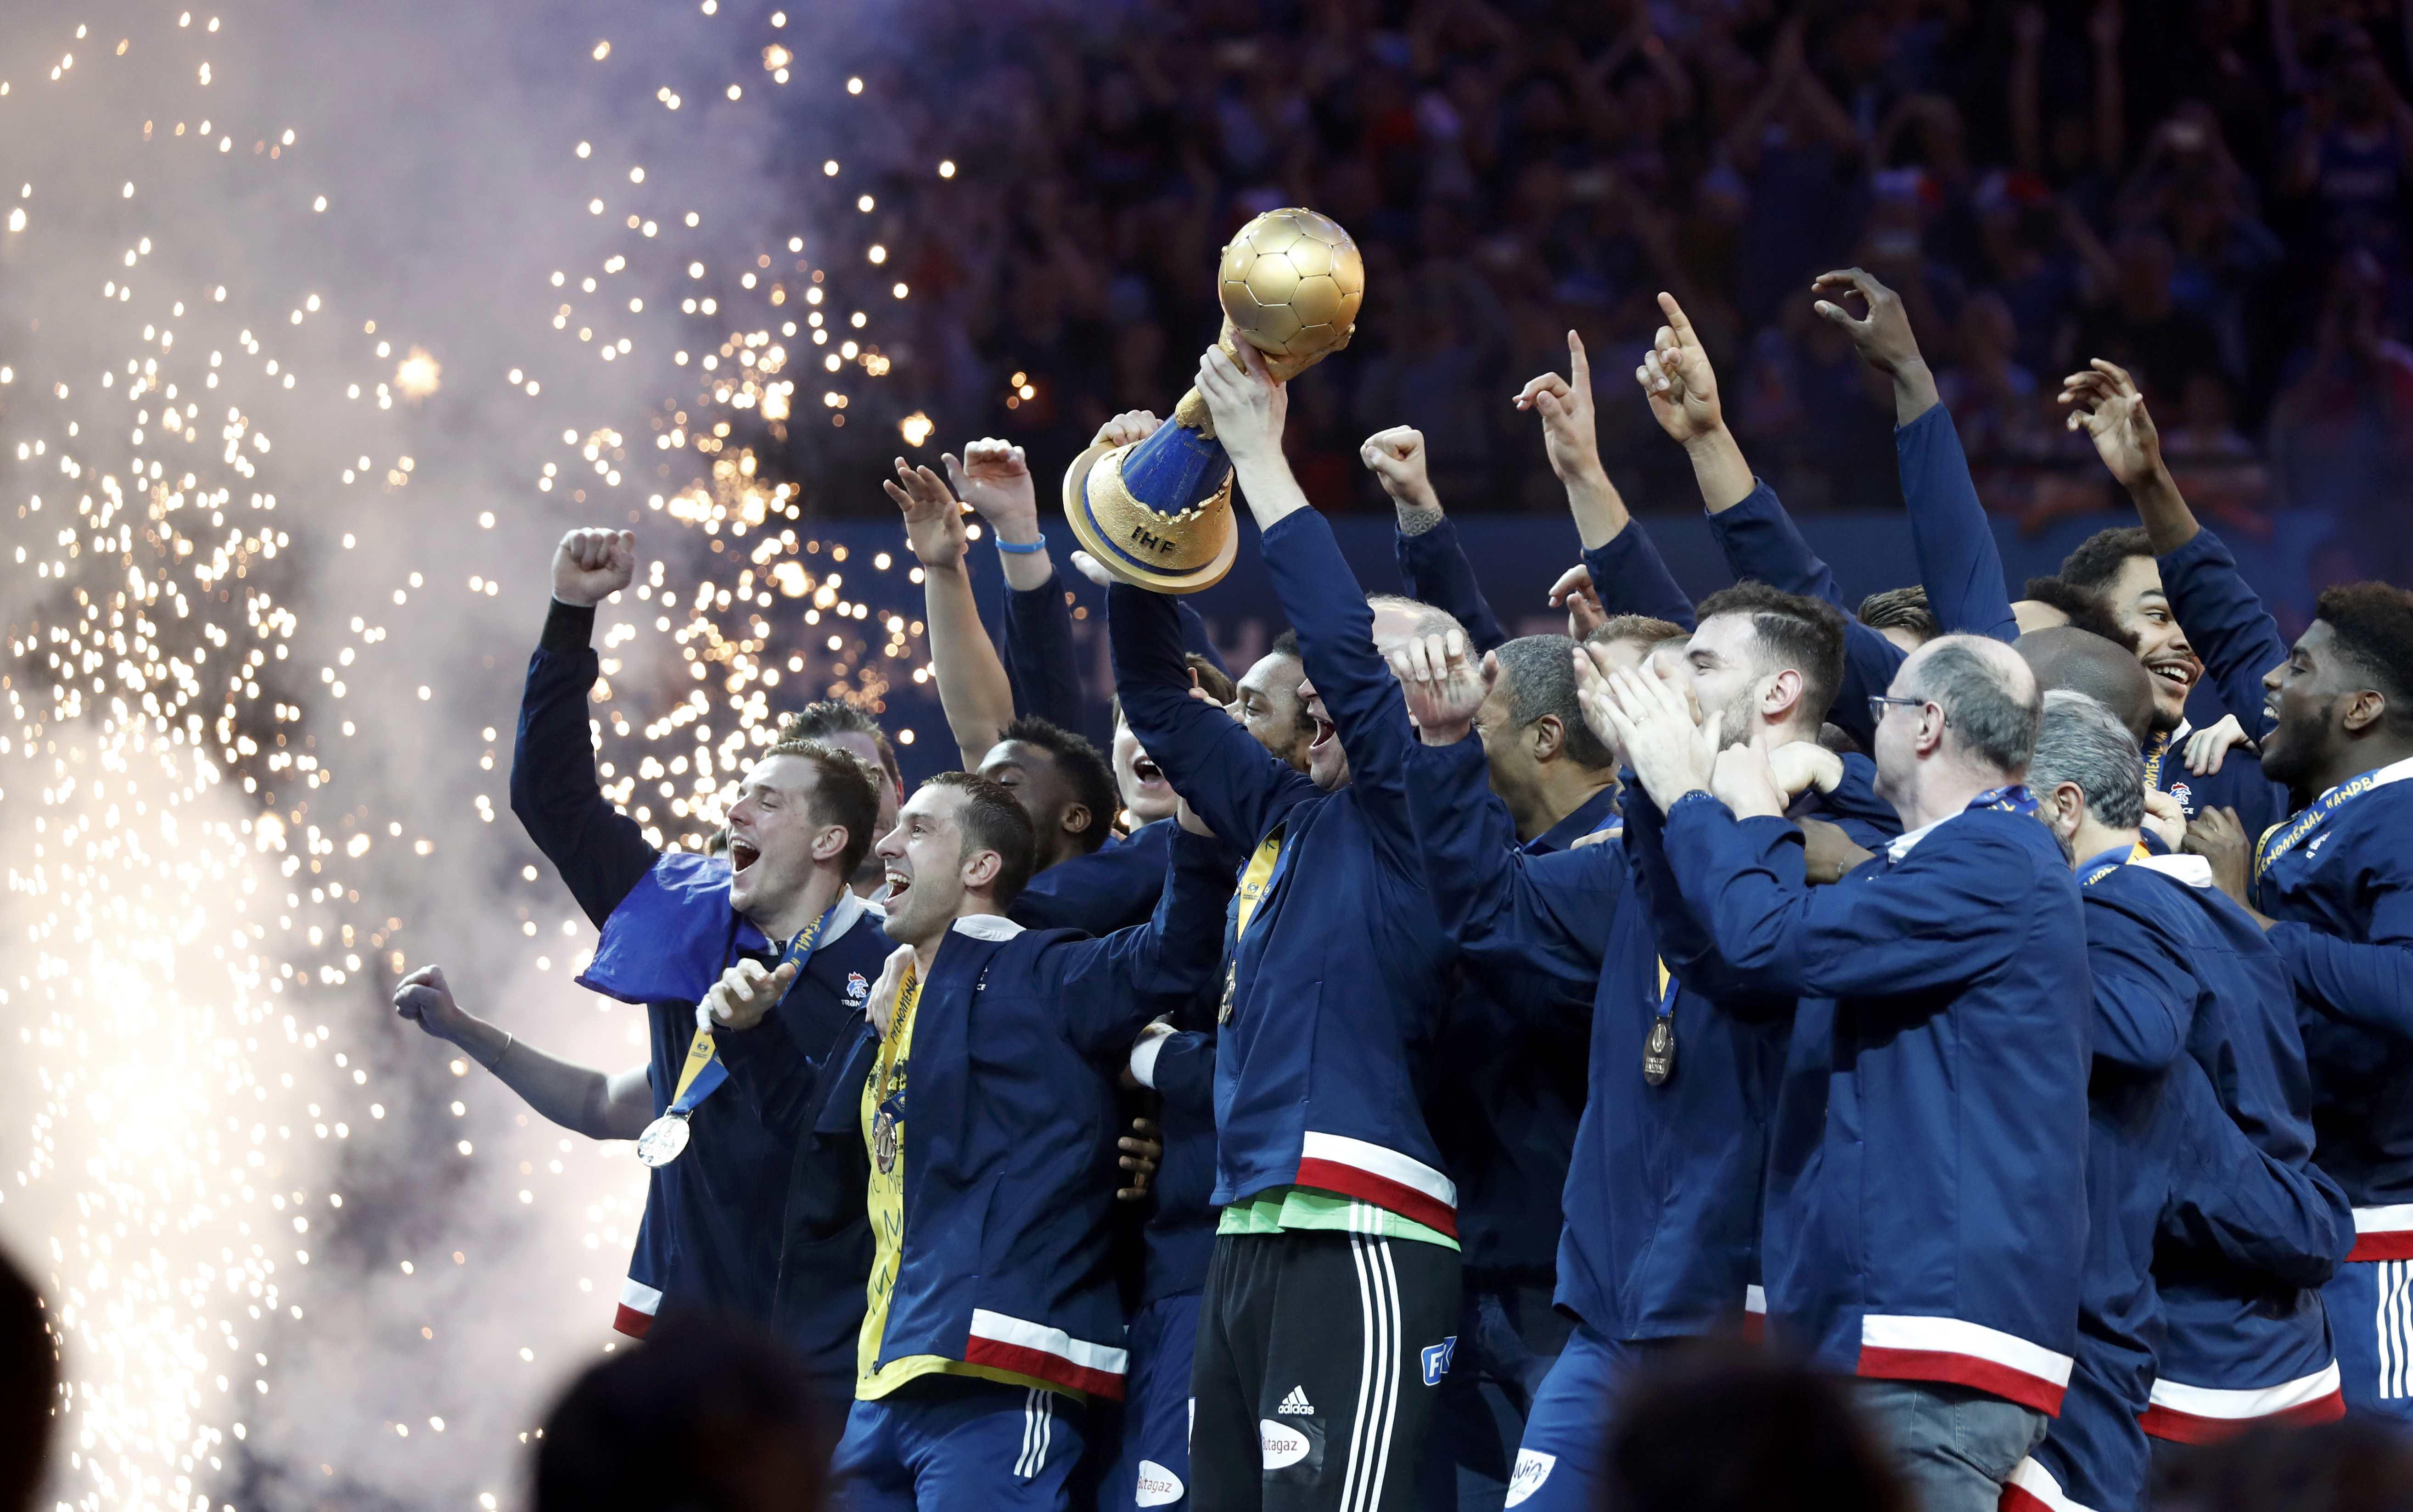 Men's Handball - France v Norway - 2017 Men's World Championship, Final - AccorHotels Arena, Paris, France - 29/01/17 - France's team celebrates gold medal on the podium     REUTERS/Charles Platiau